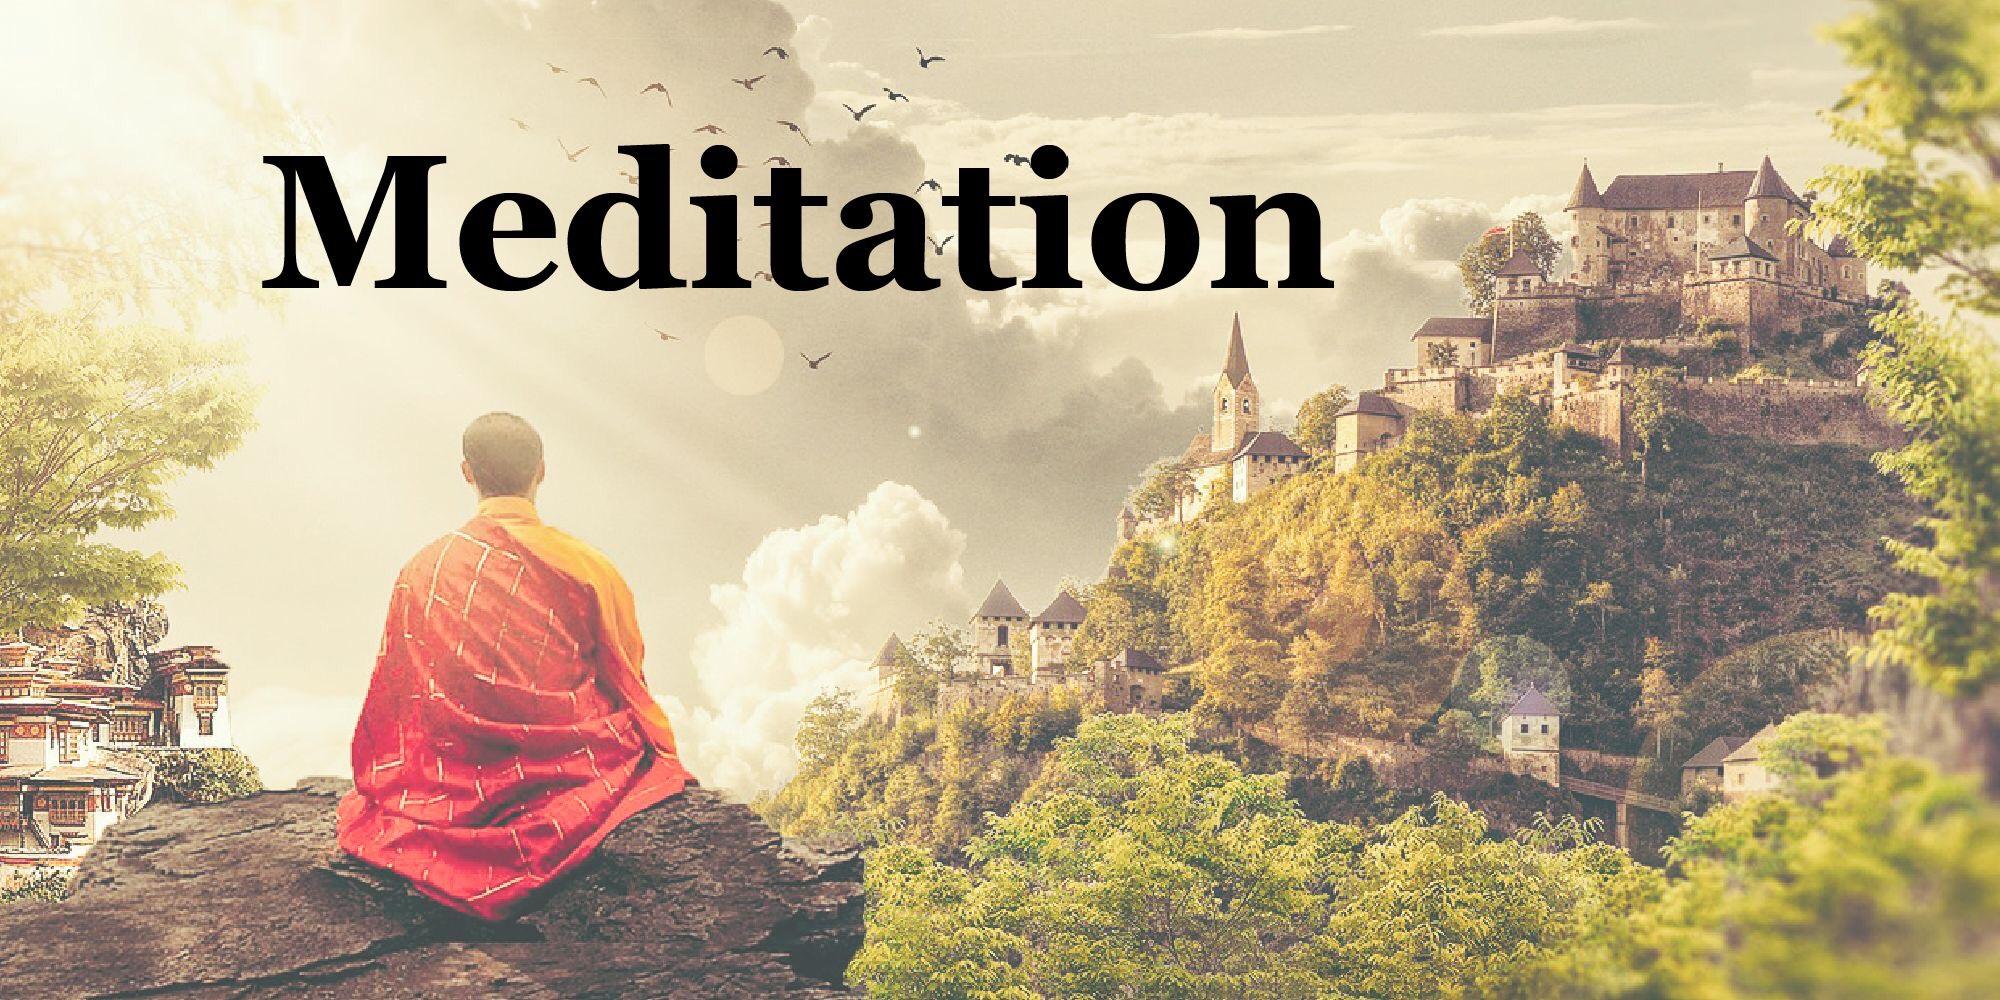 Meditation and mindfulness,